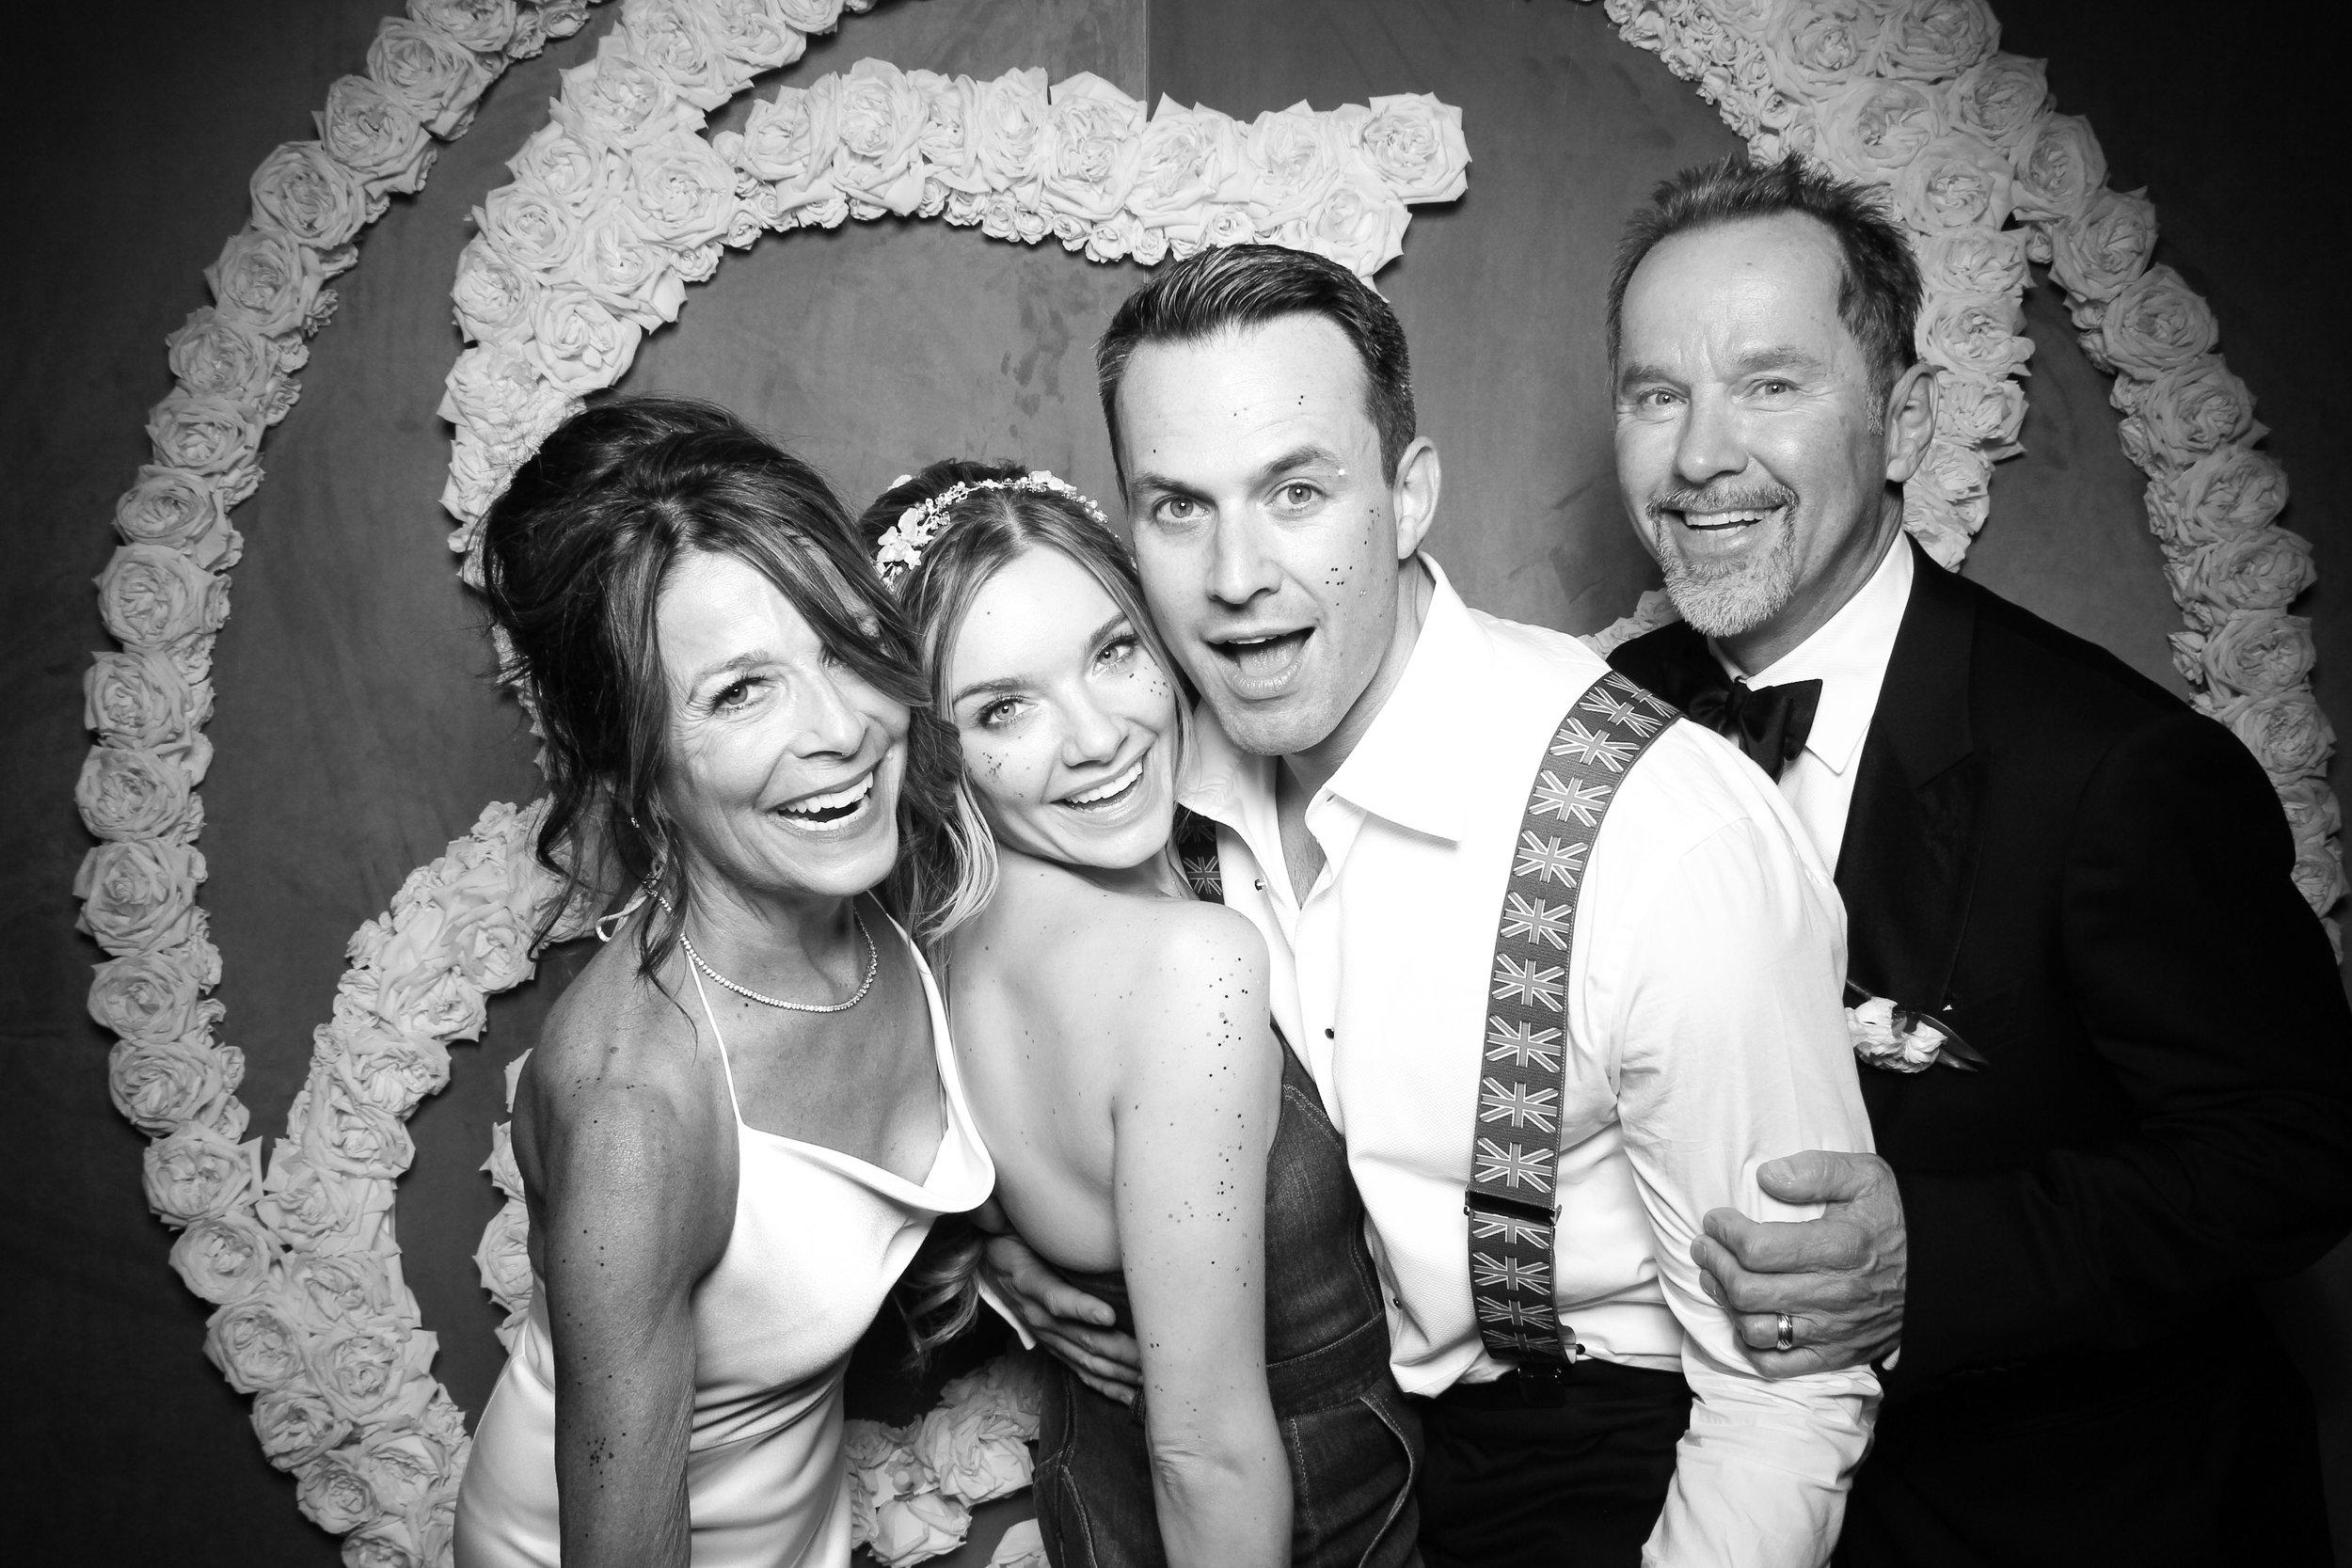 Photo_Booth_Rental_At_Standard_Club_Wedding_Chicago_19.jpg